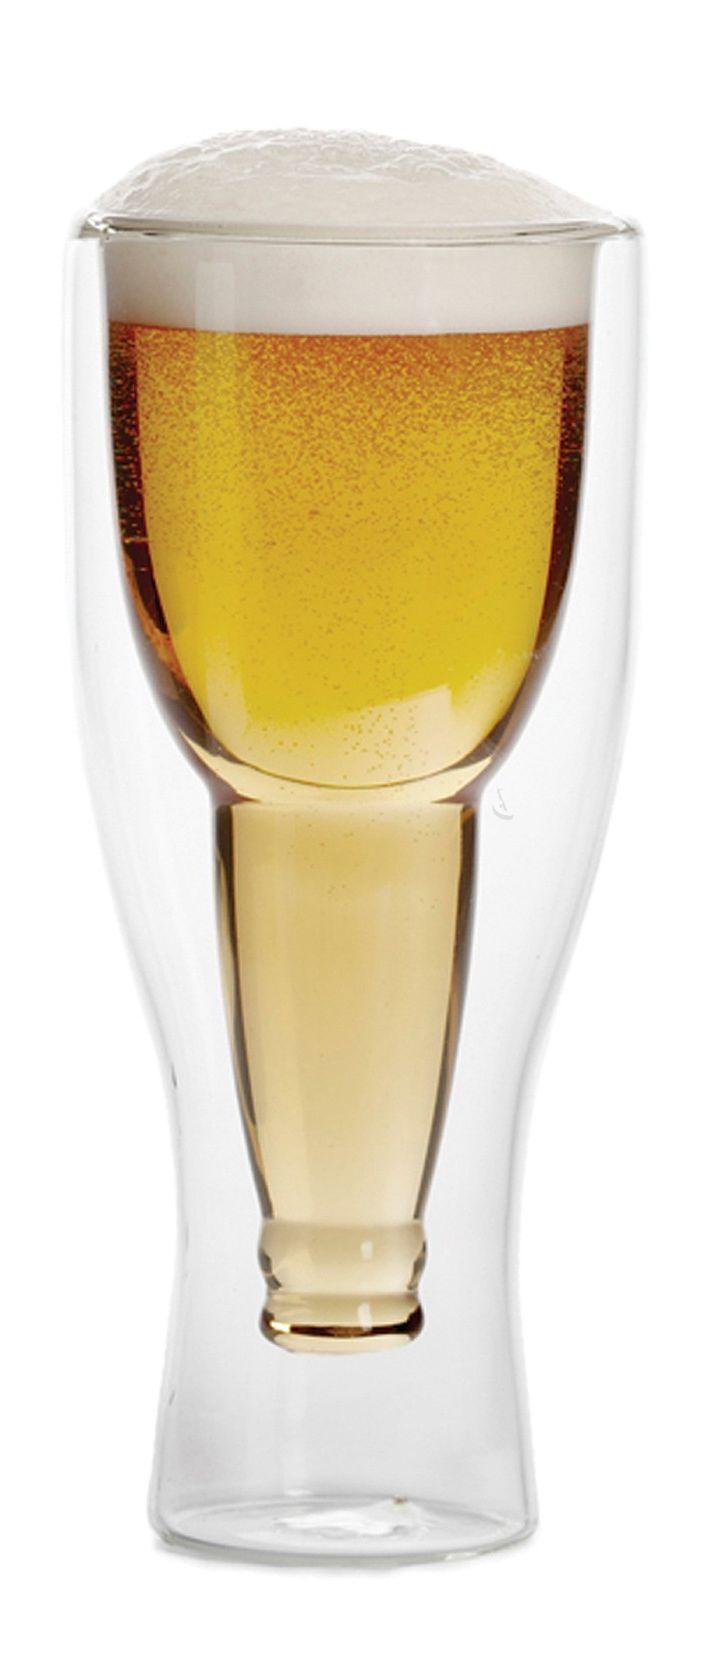 Upside down beer glass //